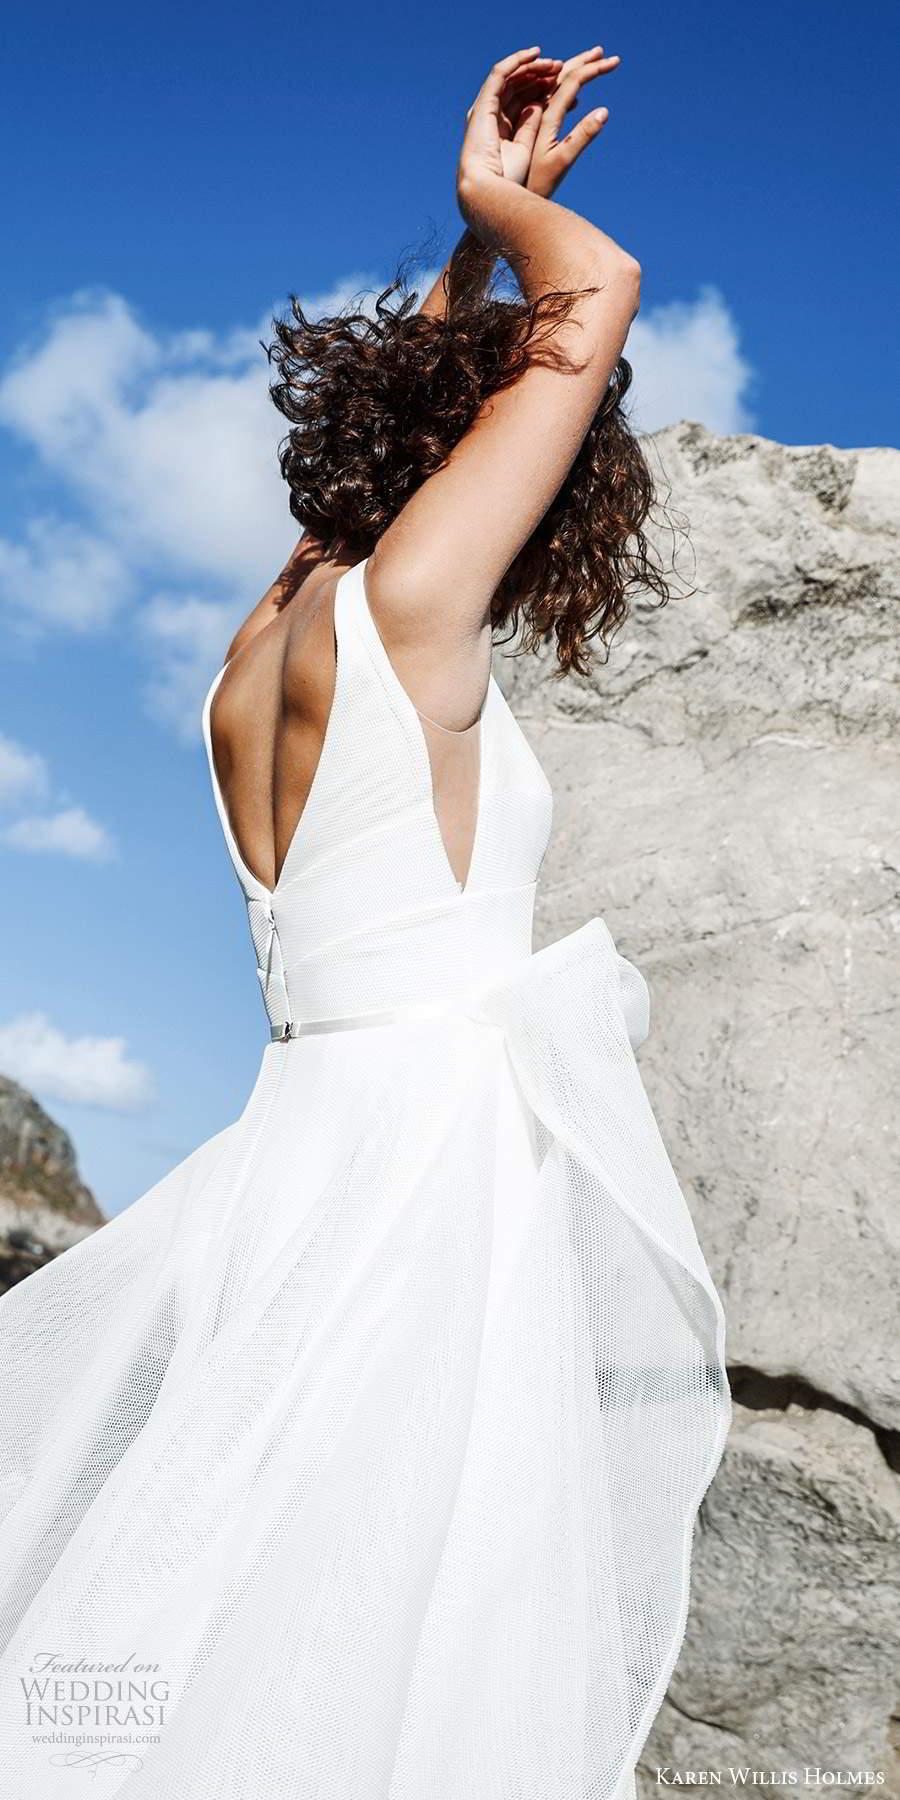 karen willis holmes 2020 bridal sleeveless straps v neckline clean minimally embellished a line ball gown wedding dress chapel train (3) zbv